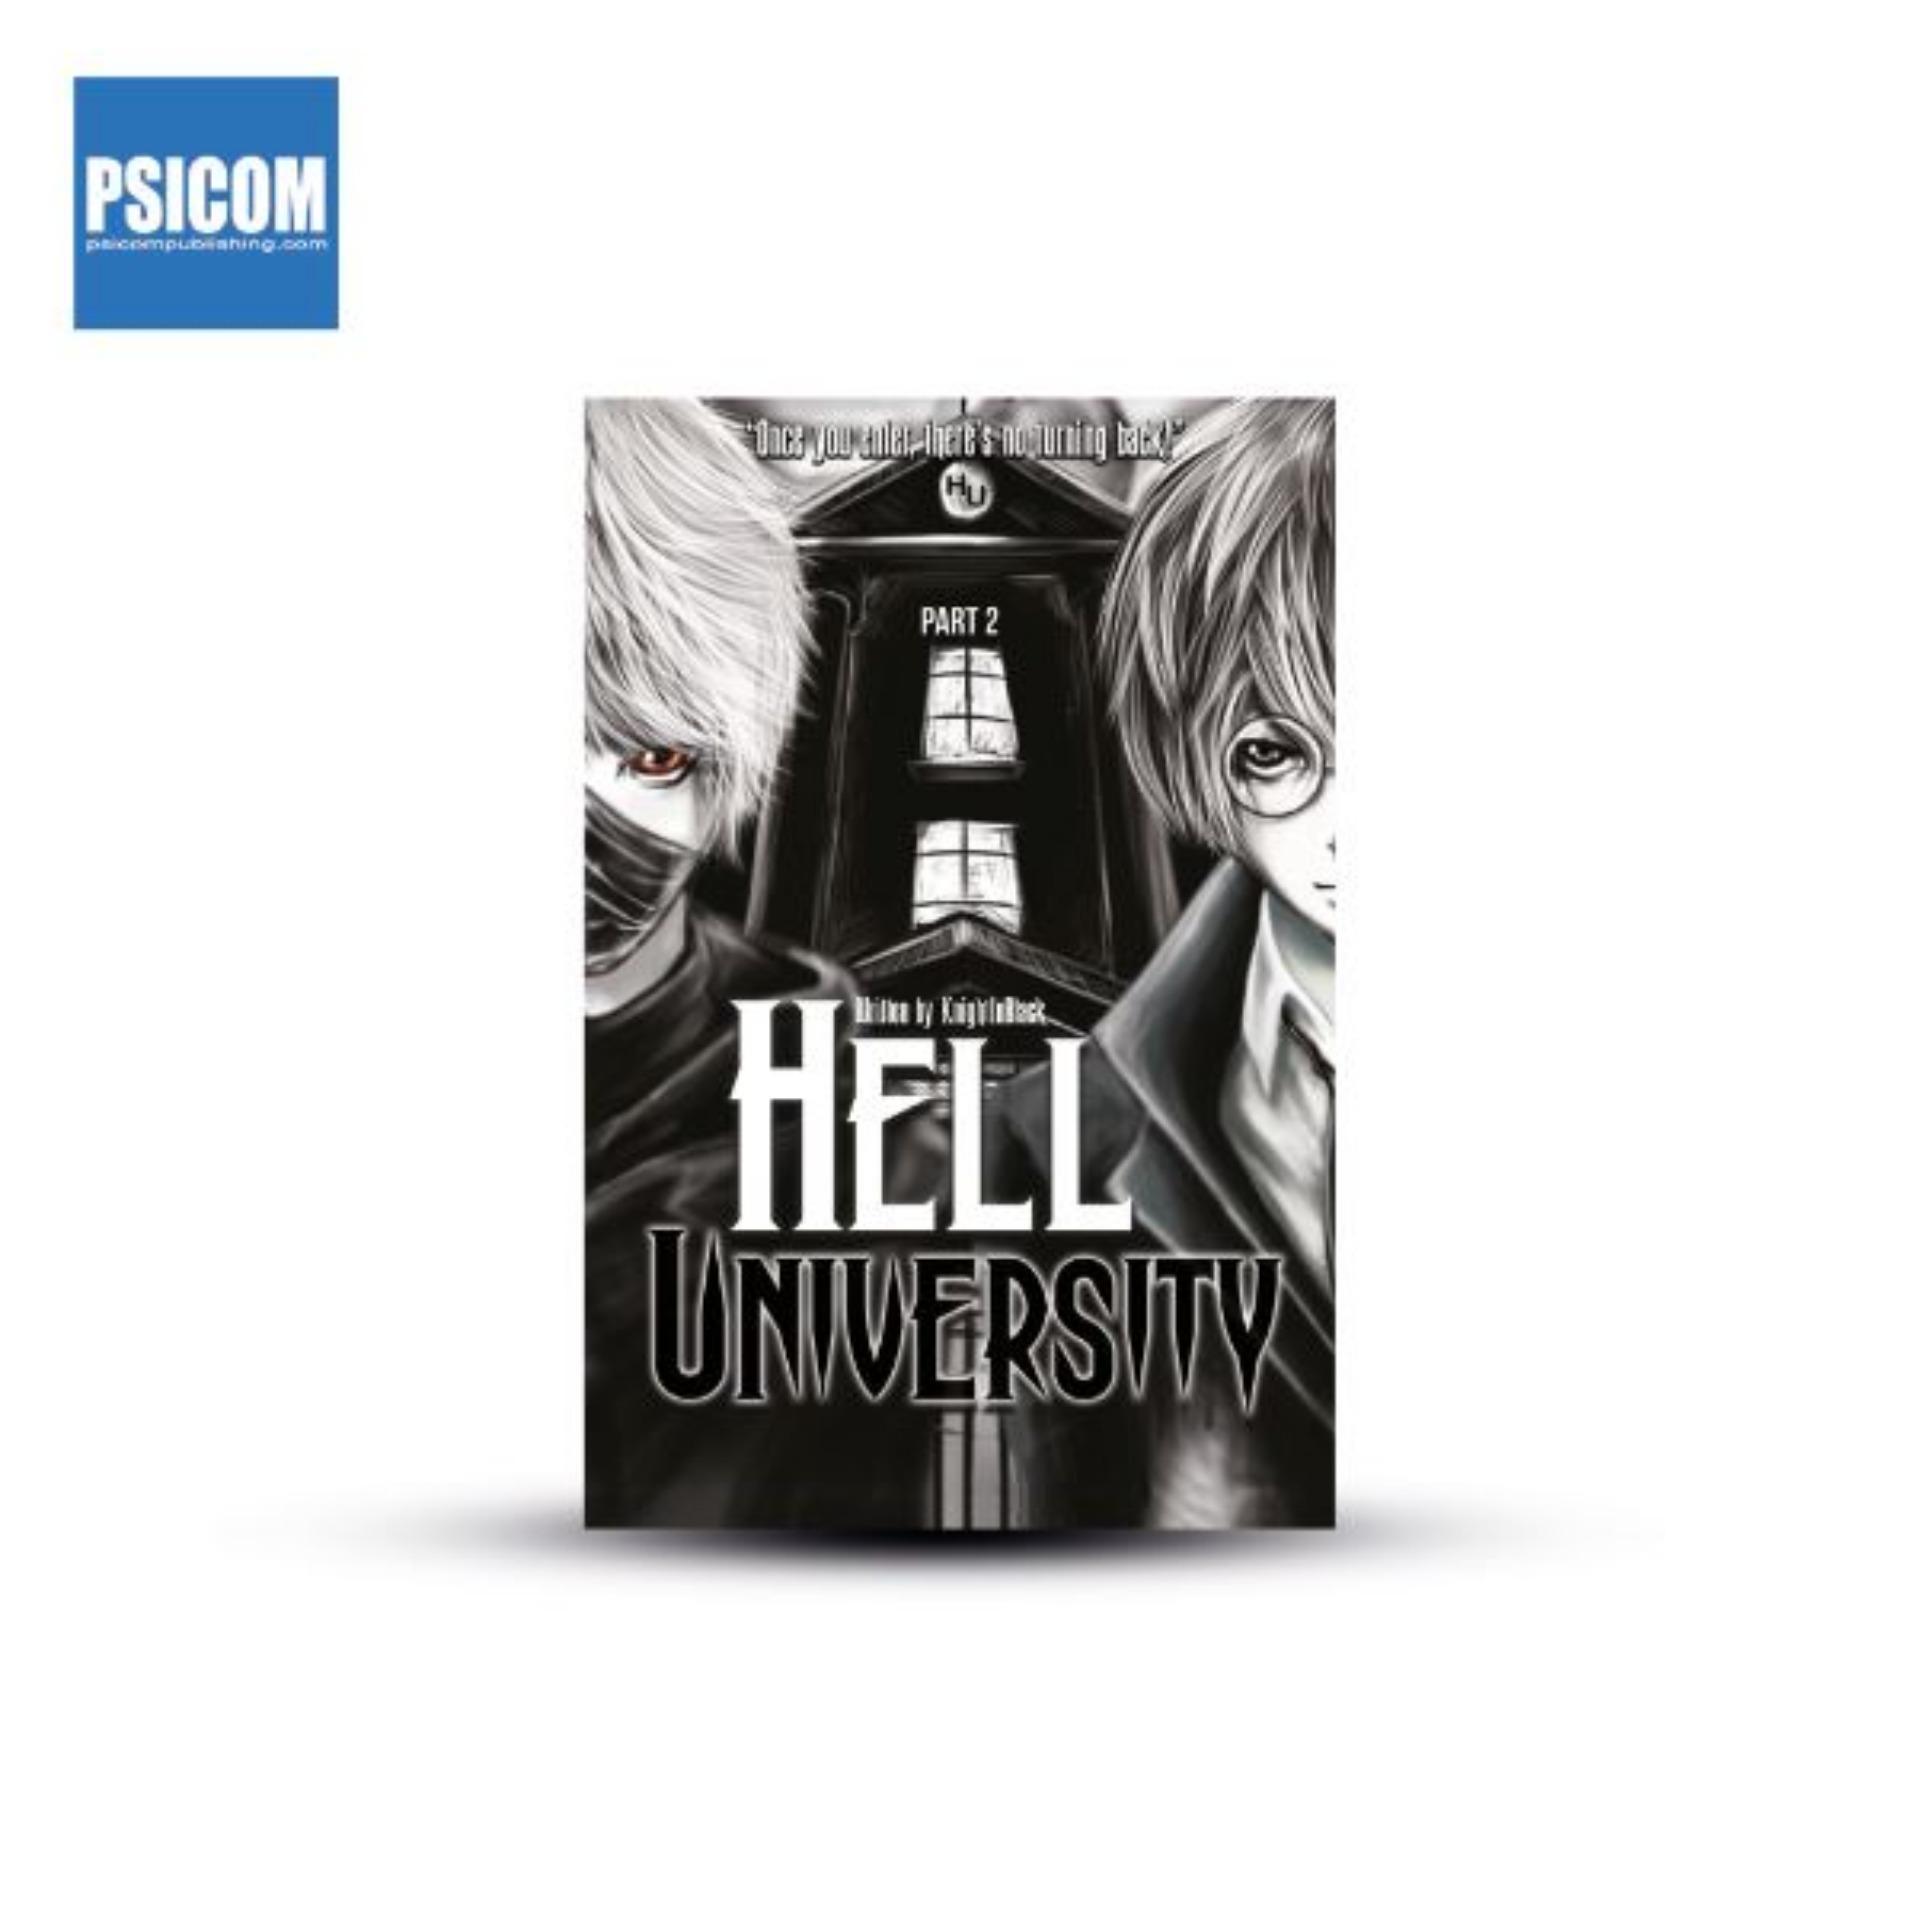 Hell University 2 by KnightinBlack (Wattpad / PSICOM)